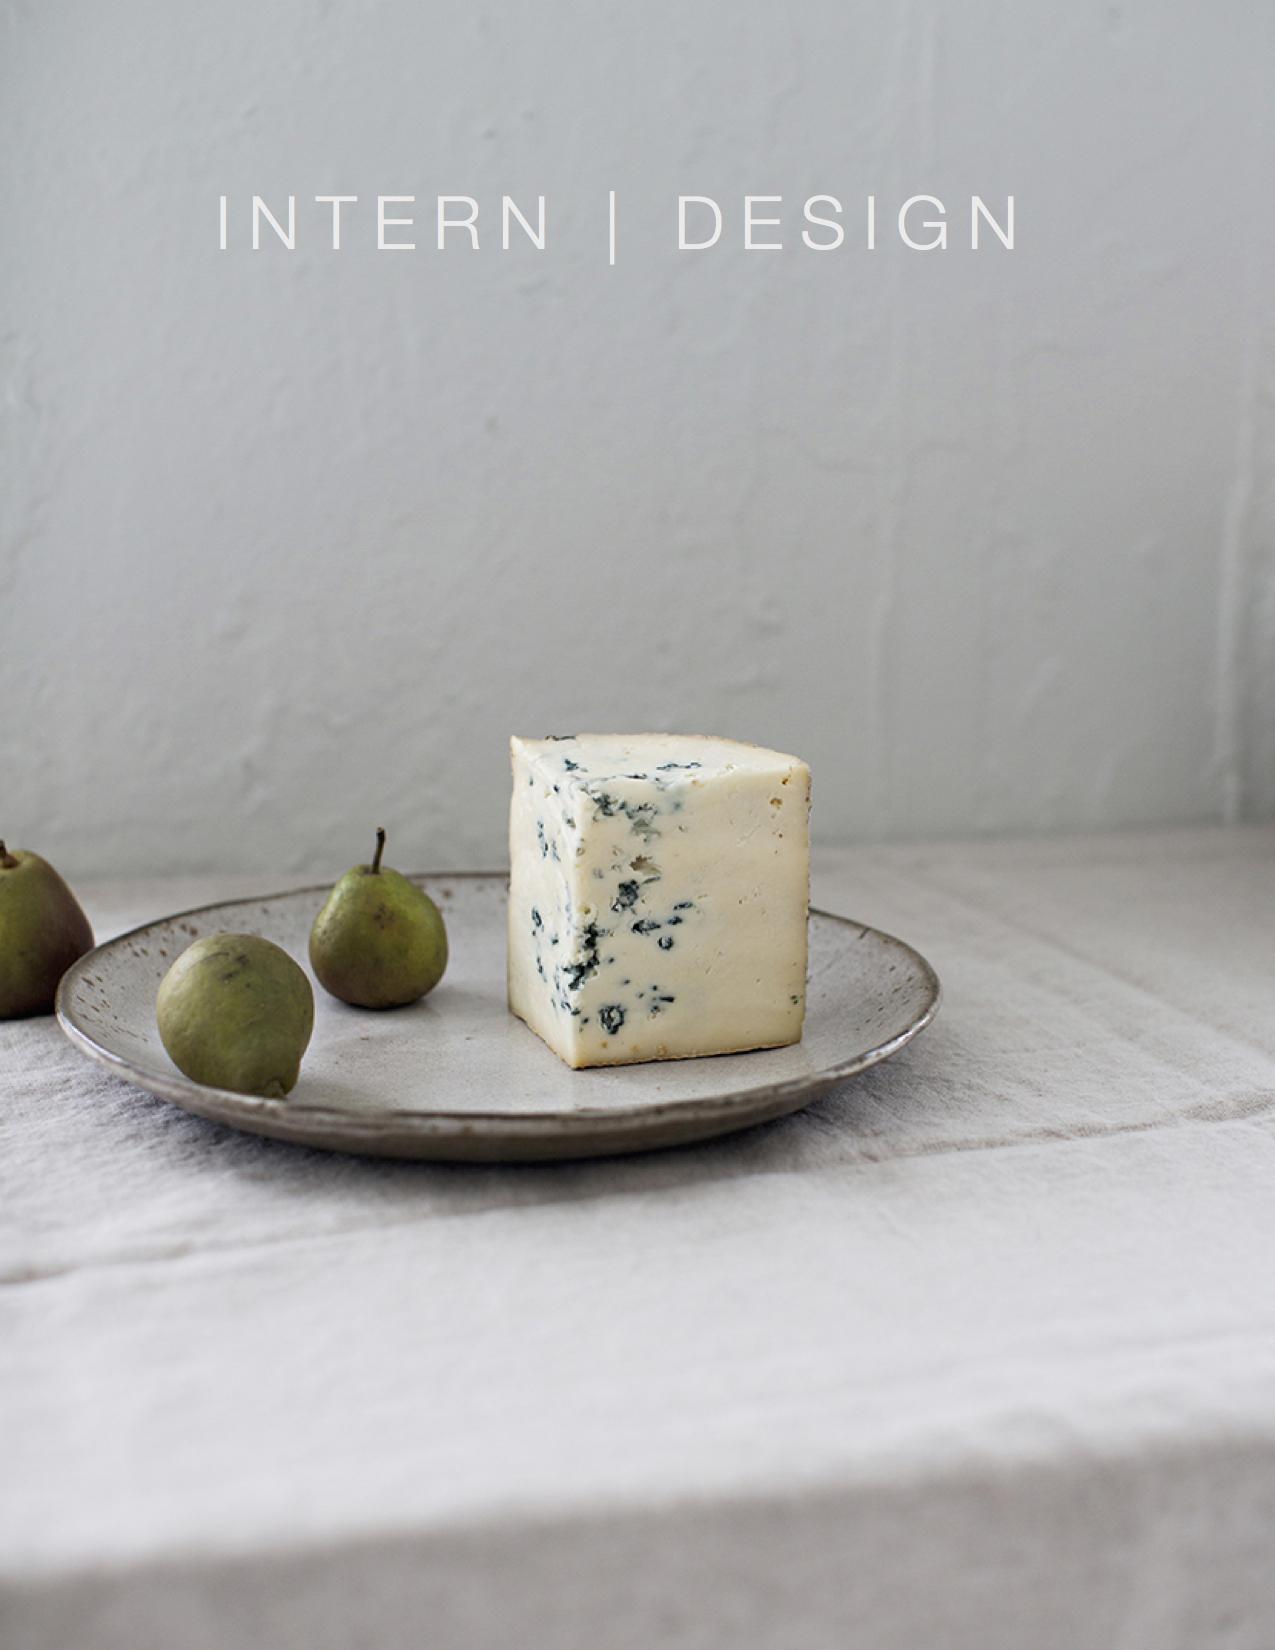 intern_blog